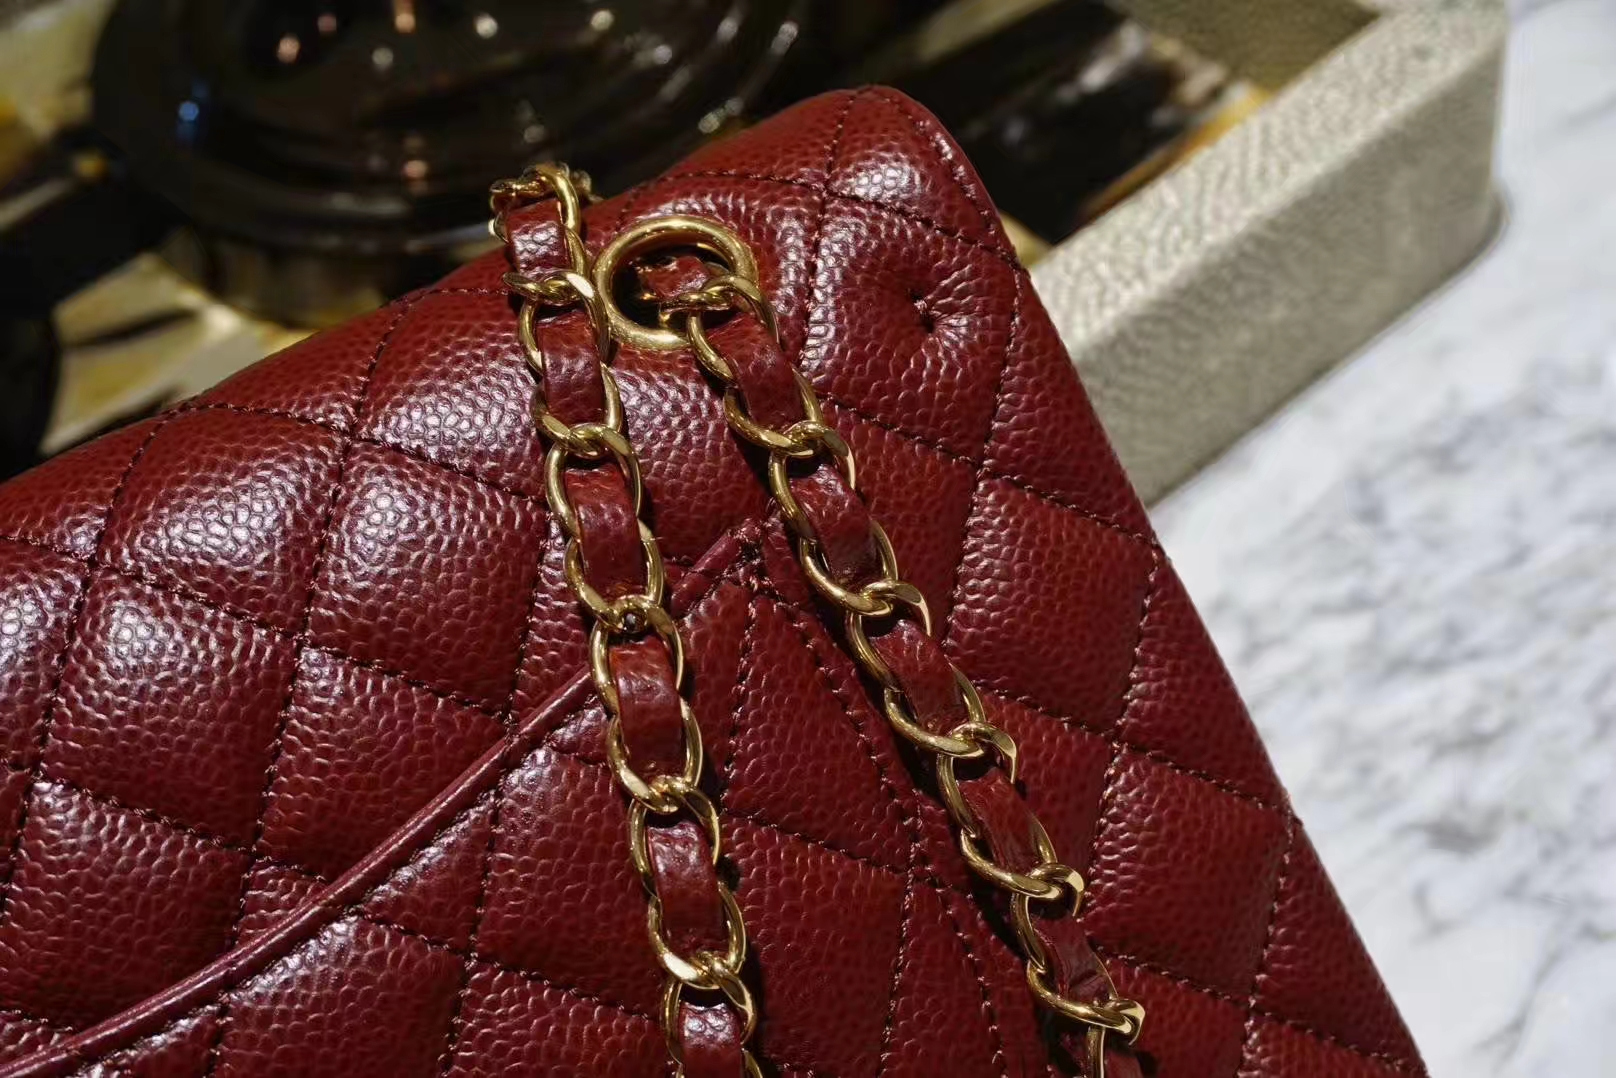 Chanel 香奈儿 Cf系列 25cm 原厂皮鱼子酱 枣红色 金色五金